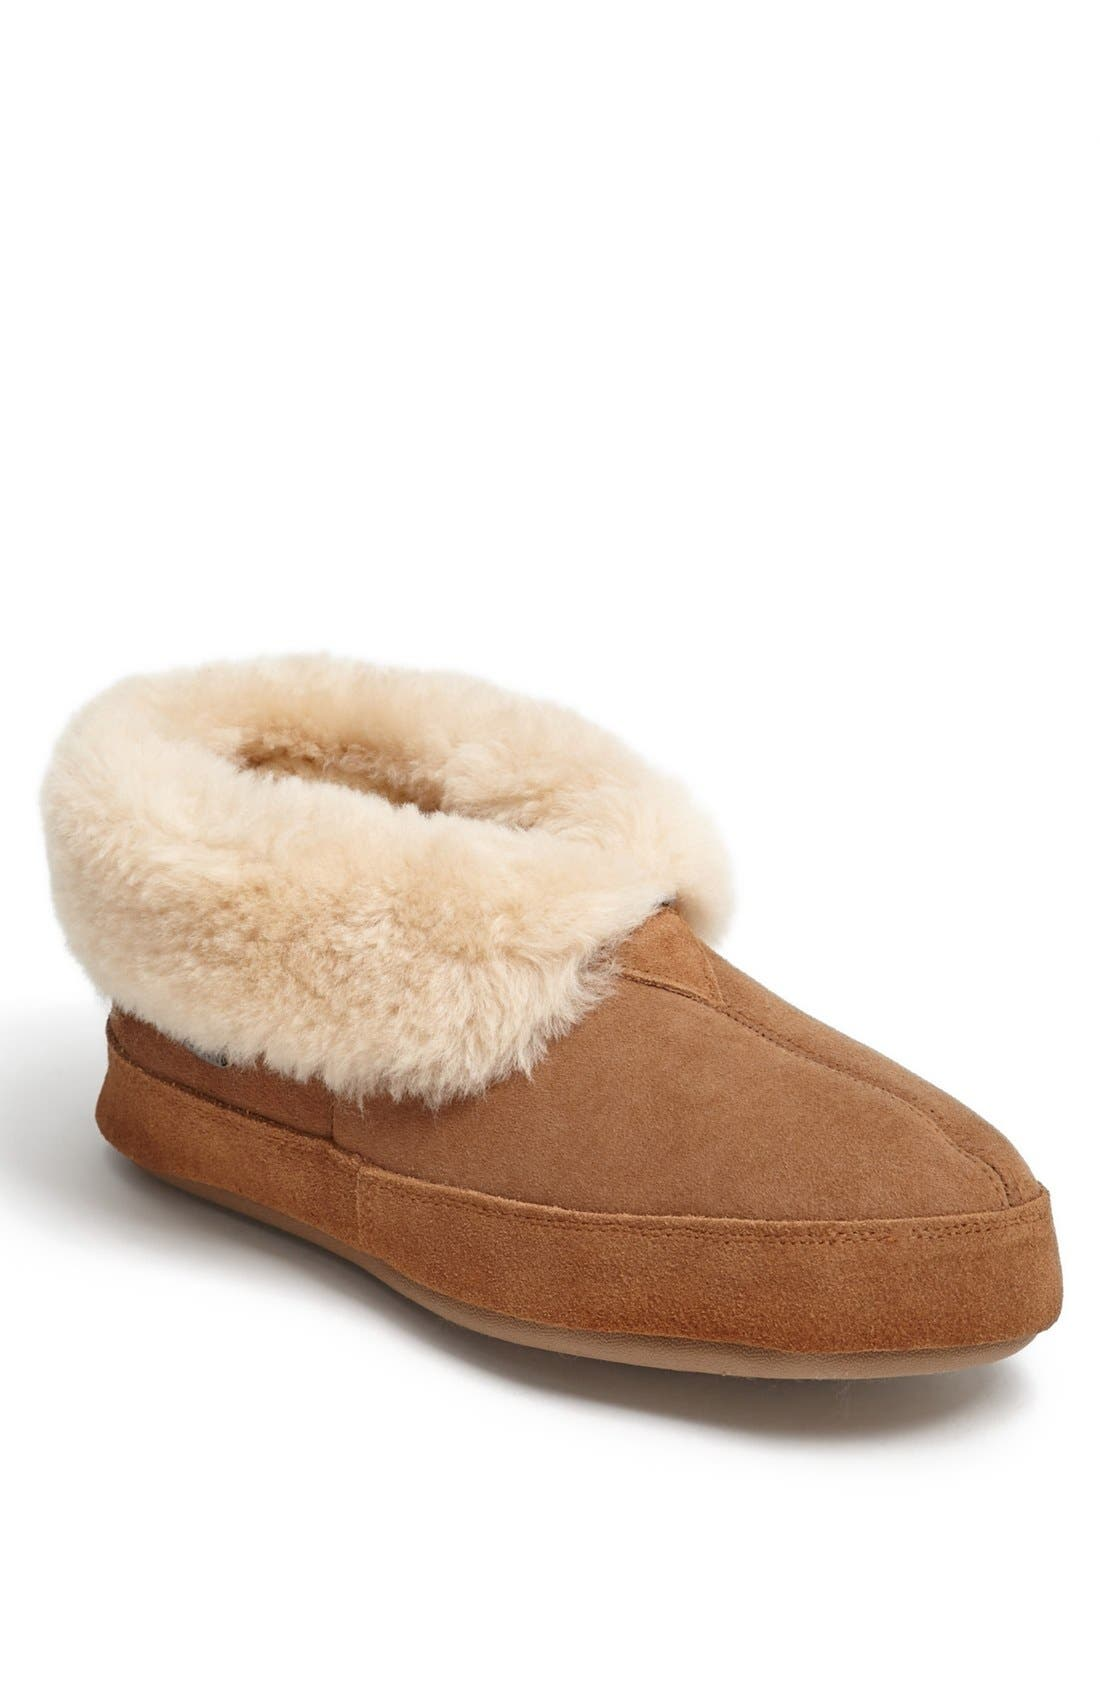 Genuine Sheepskin Slipper,                         Main,                         color, Walnut